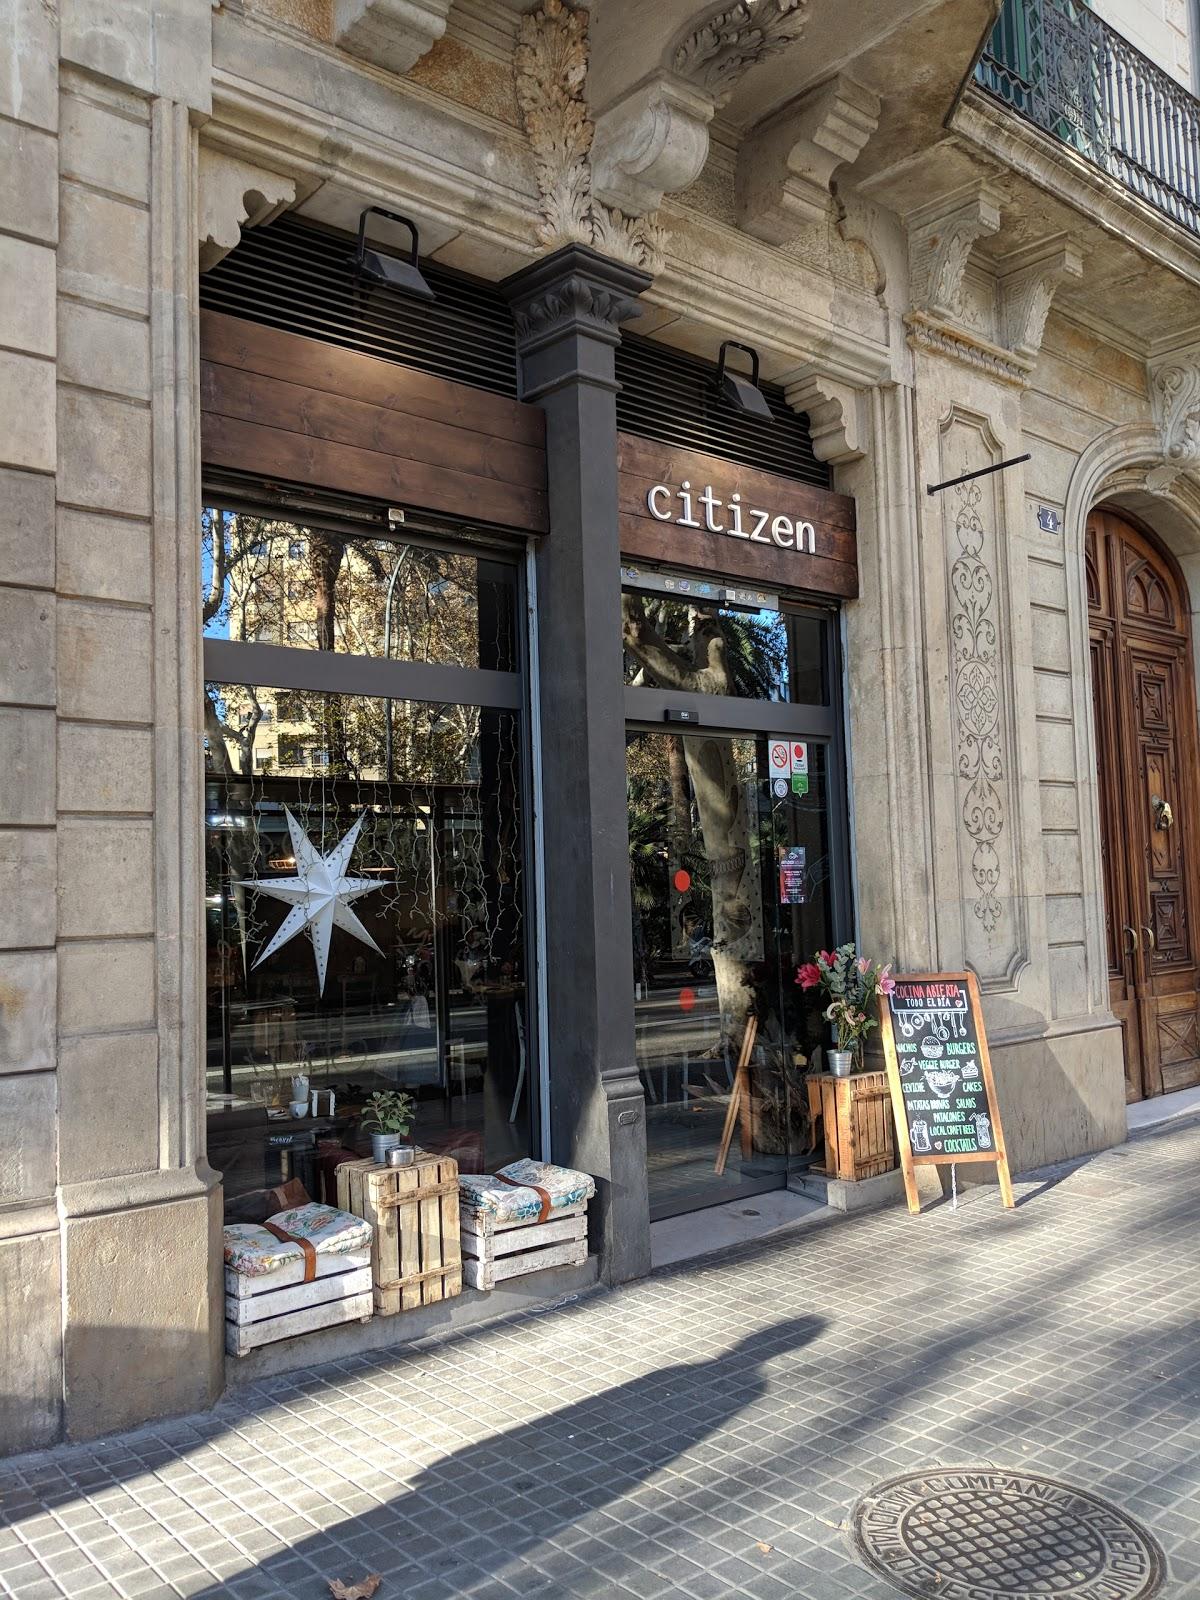 Citizen Café: A Work-Friendly Place in Barcelona